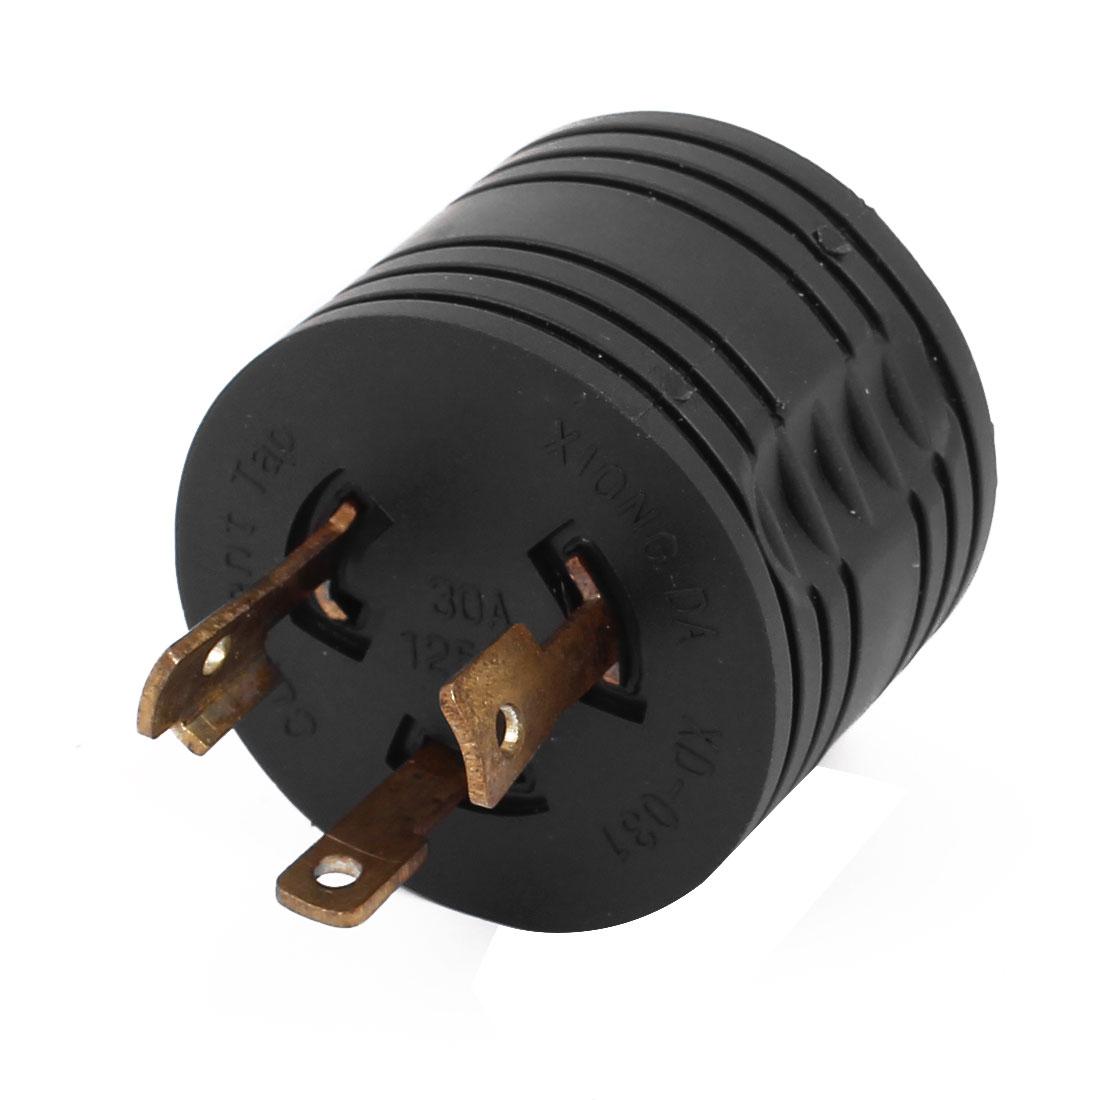 Industrial Grade 125v 30a L5 30p Us Twist Lock Power Plug To Tt 30r Wiring Ac Rv Adapter